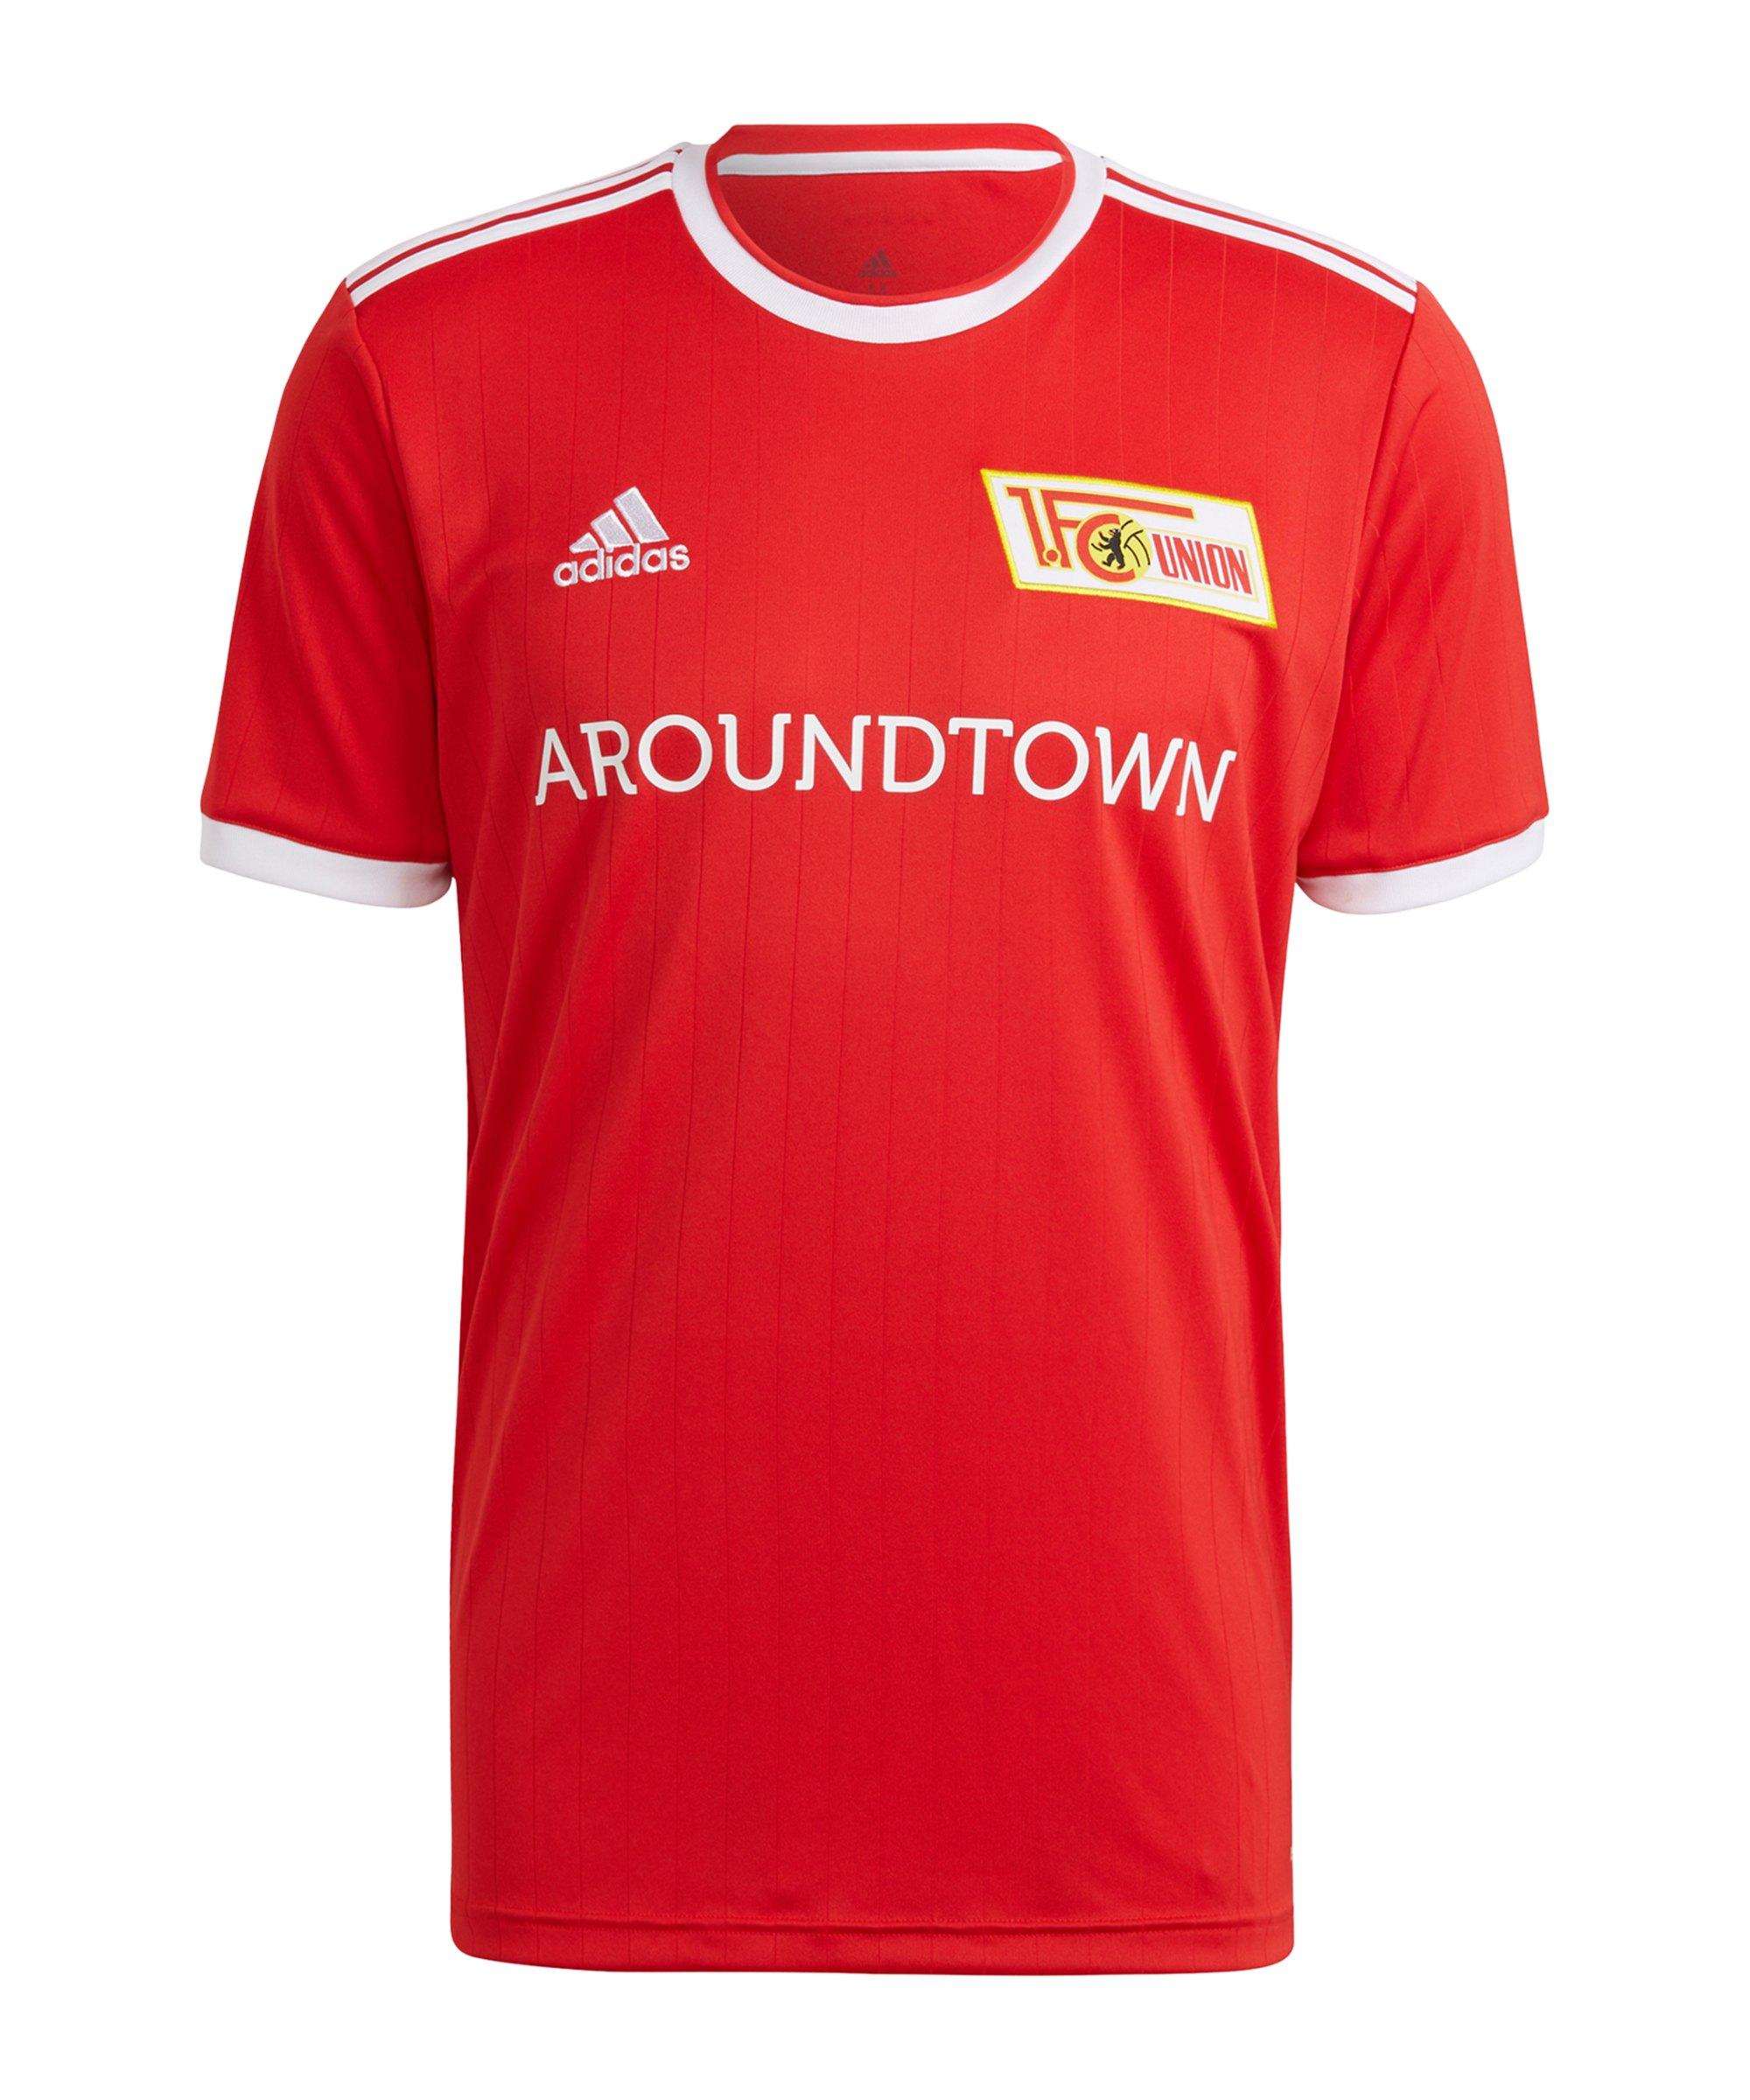 adidas 1. FC Union Berlin Trikot Home 2021/2022 Kids Rot - rot